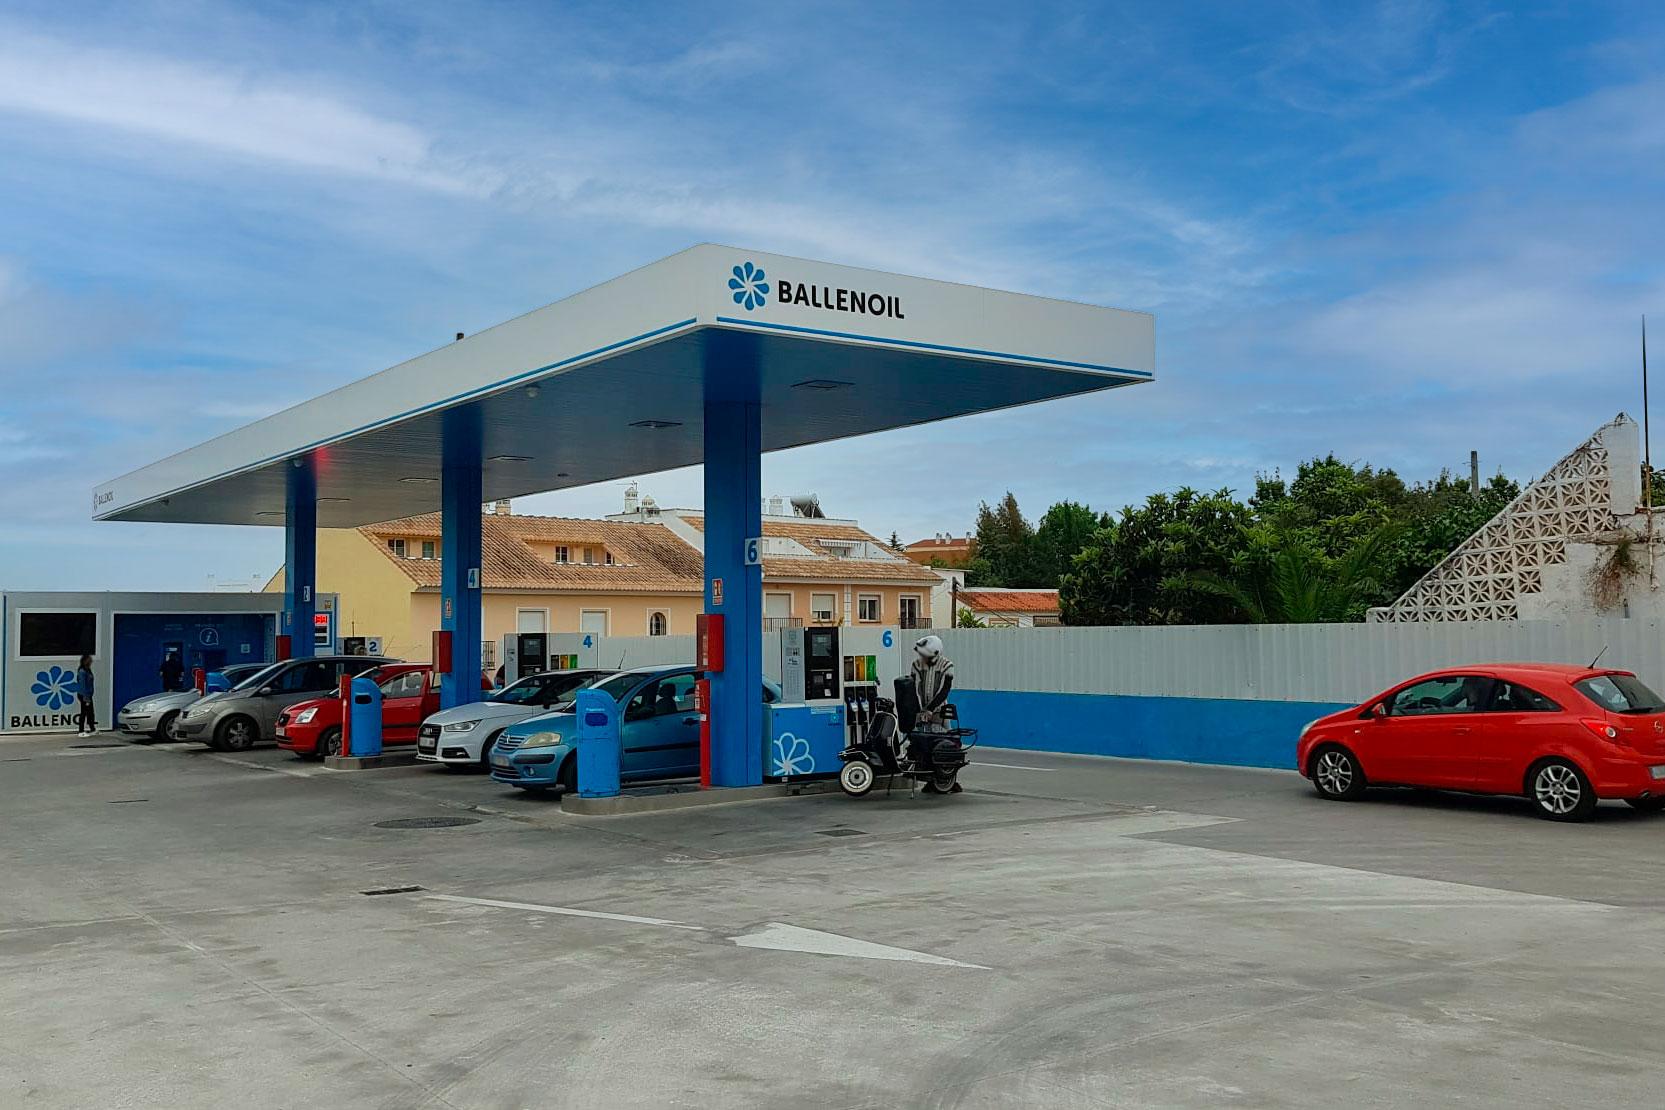 Gasolinera Ballenoil Fuengirola